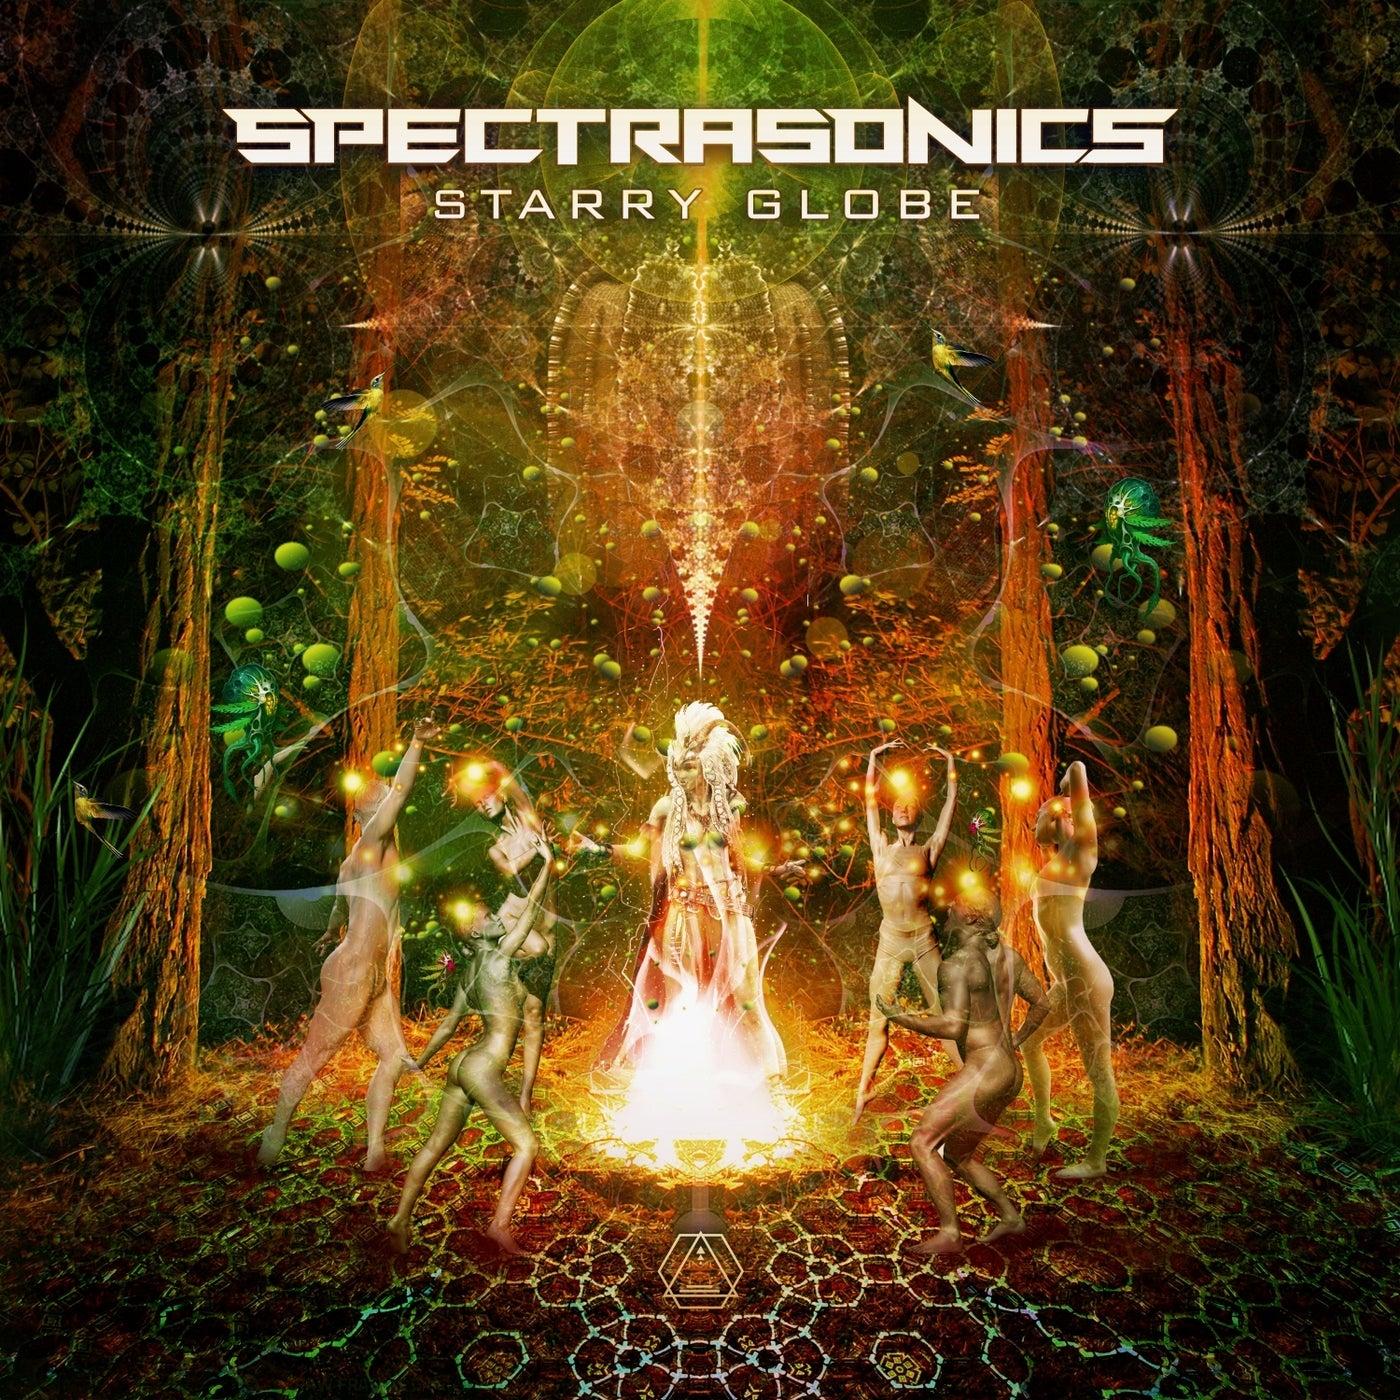 Speculation (Original Mix)